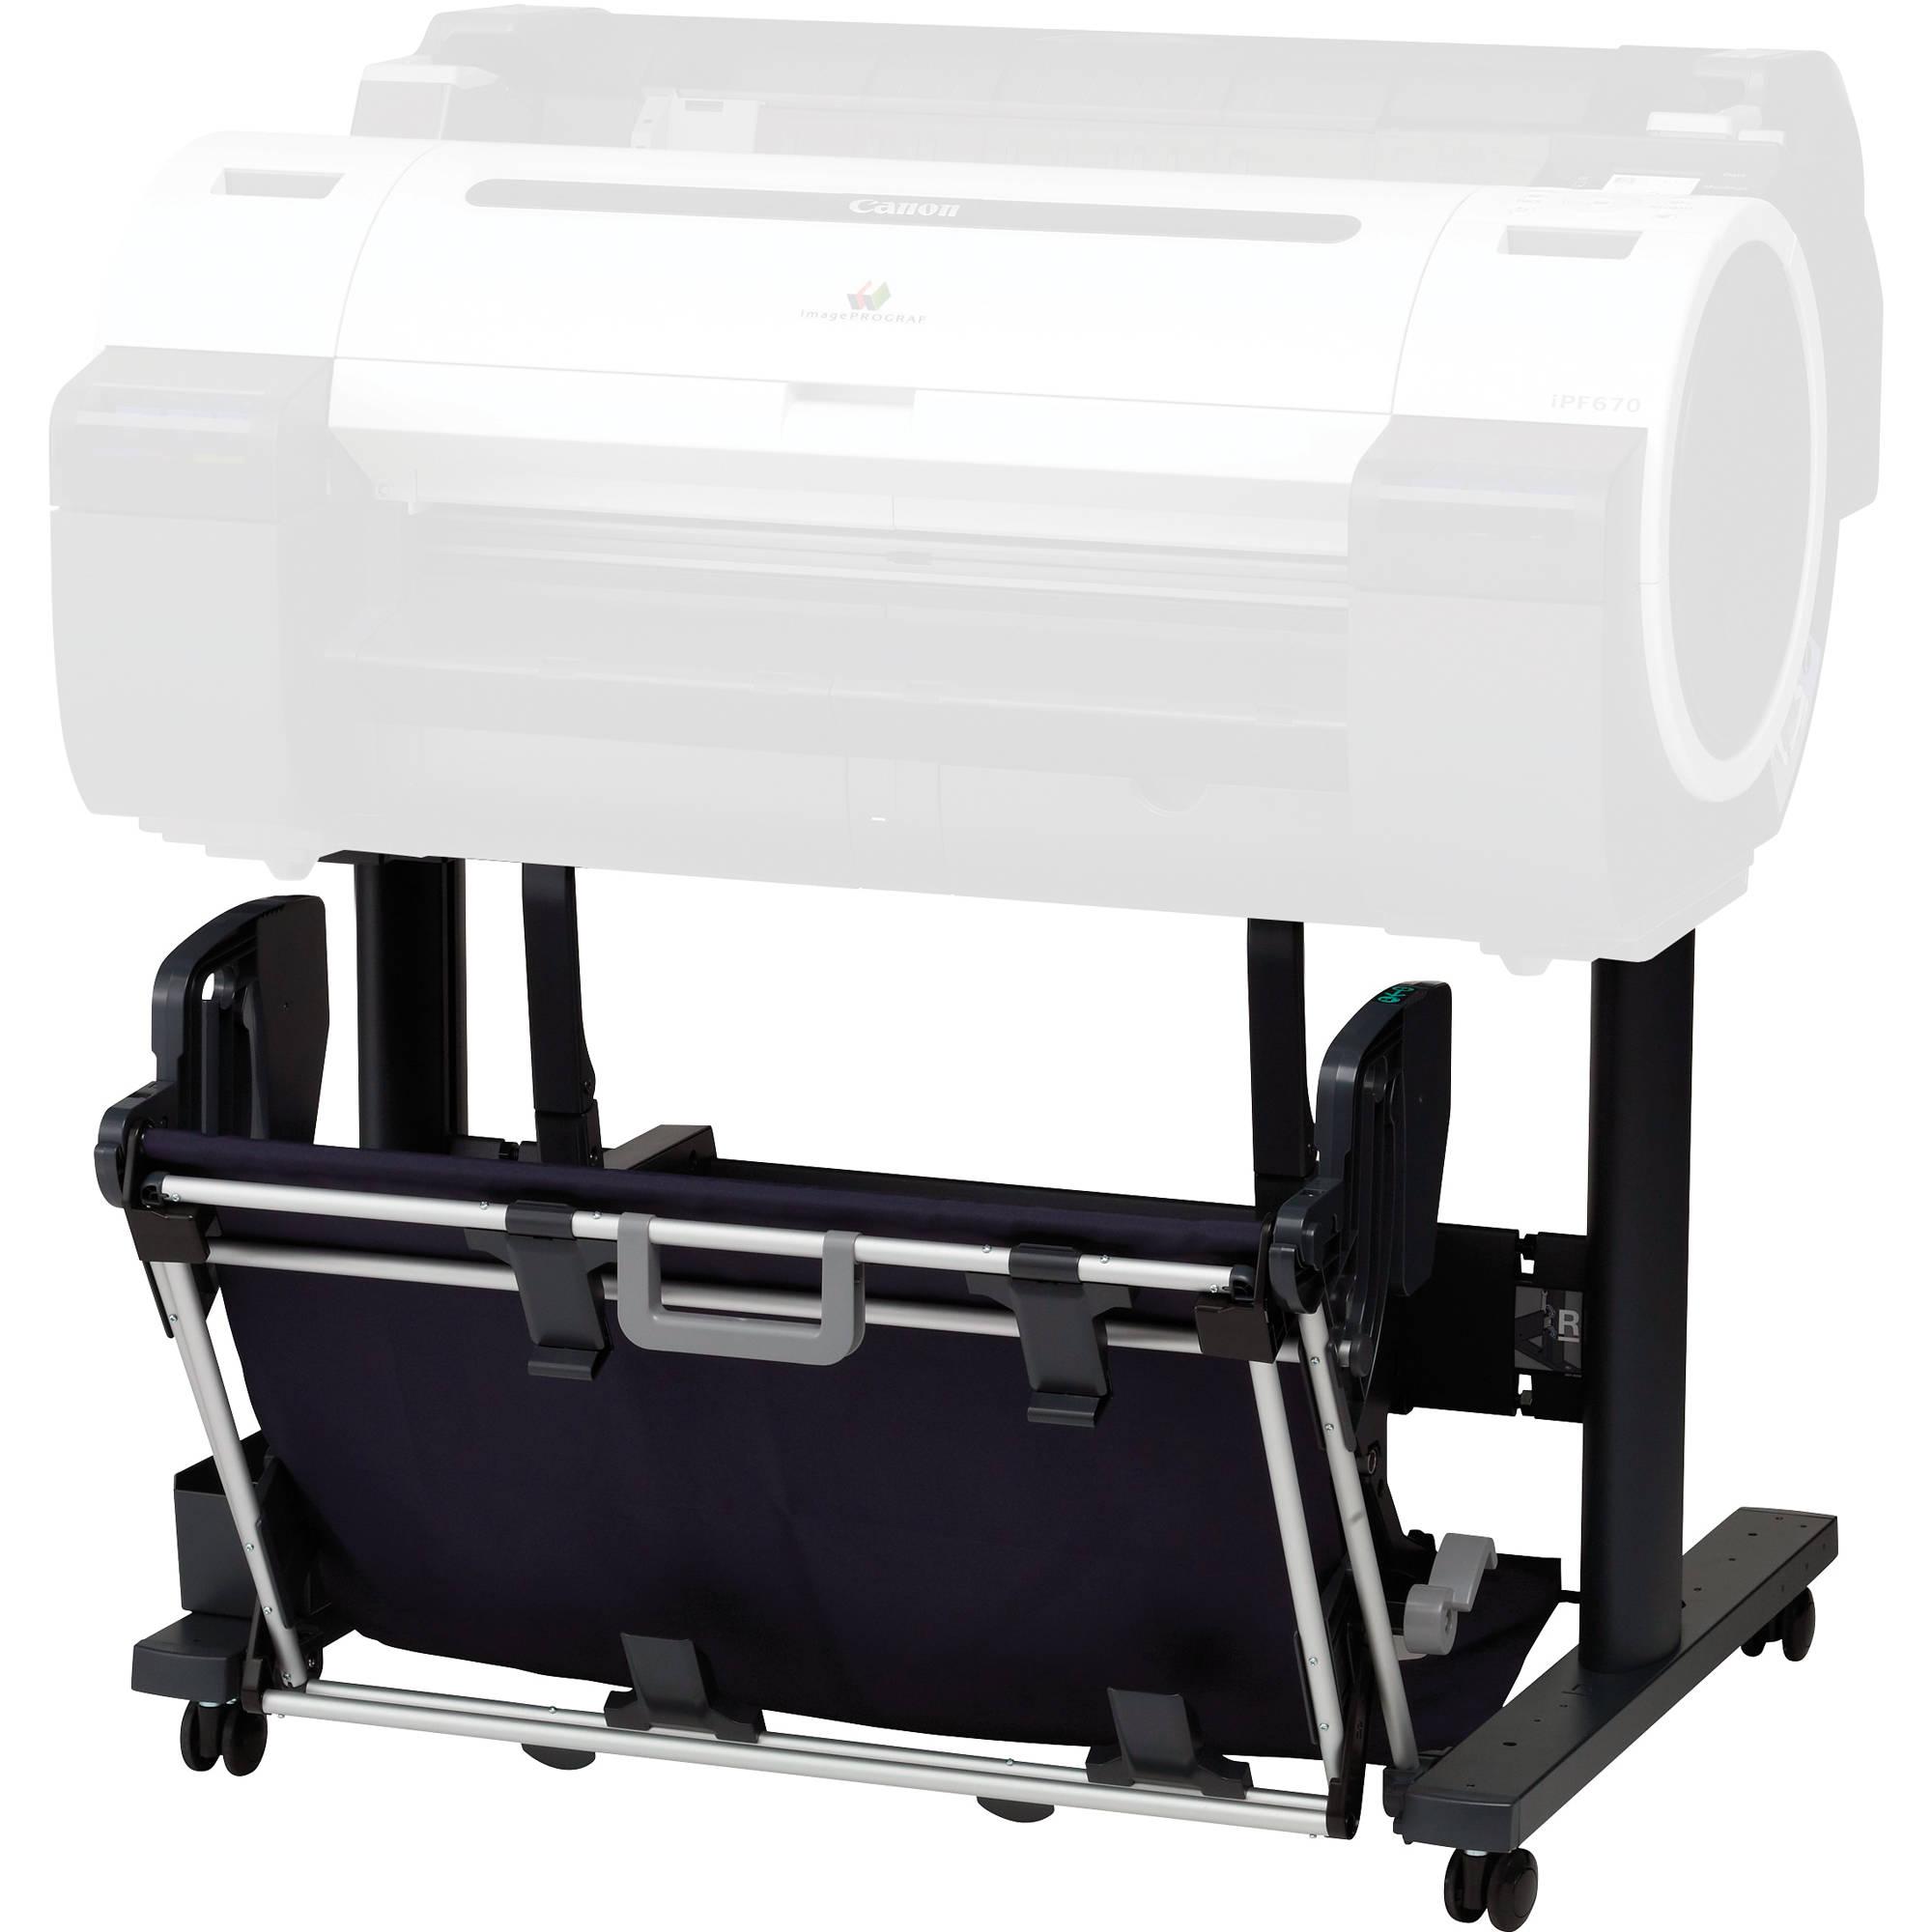 canon st26 printer stand for ipf670 printer